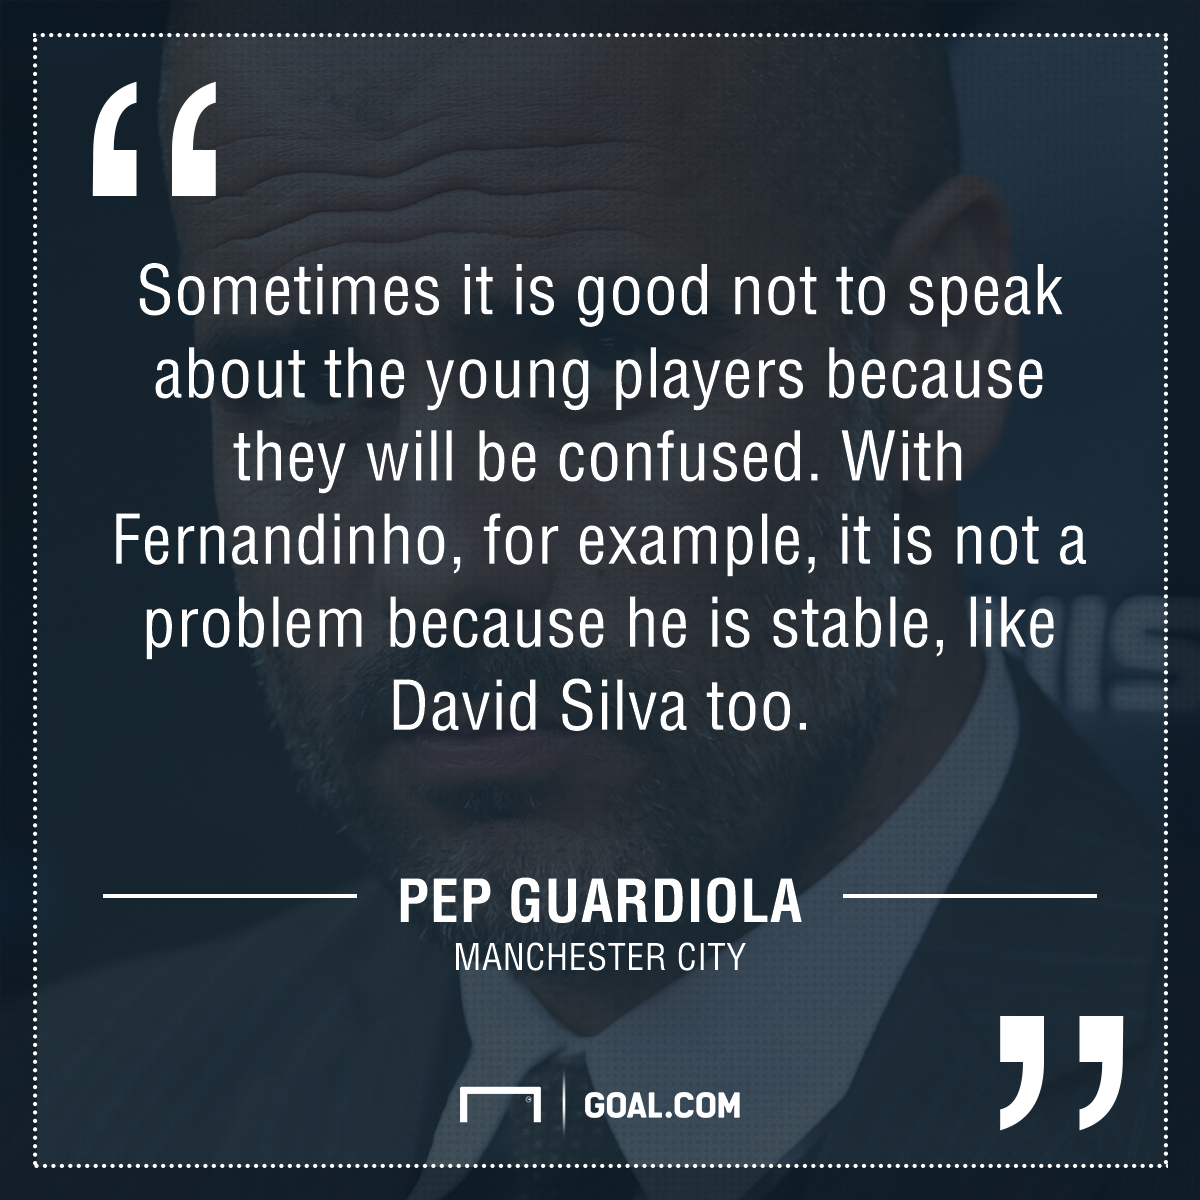 How Fernandinho won over Pep Guardiola to become Manchester City's